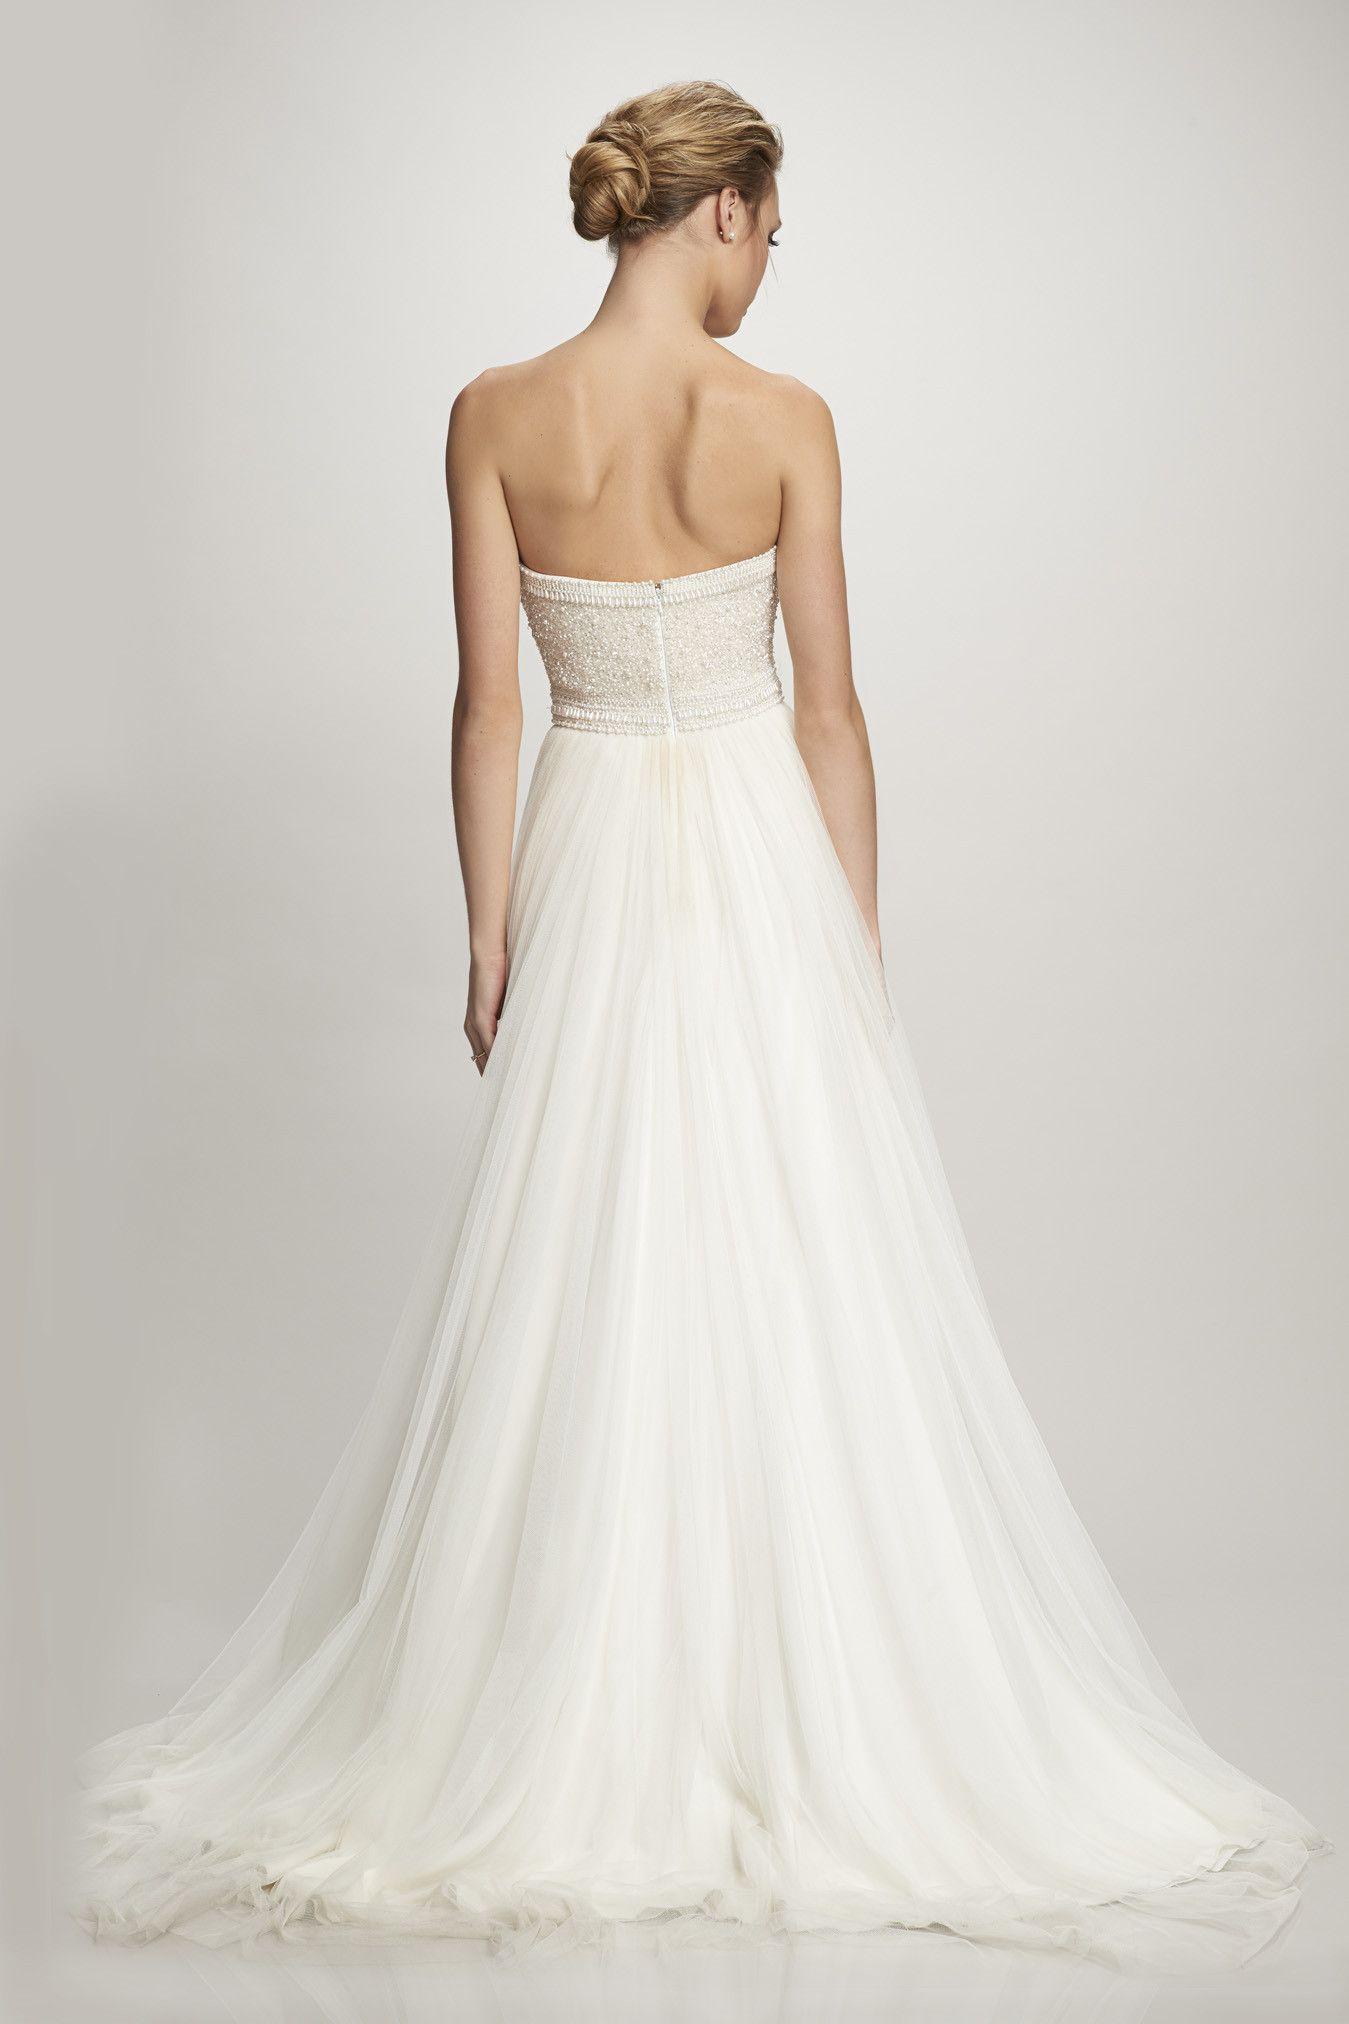 Kerry Bridal BoutiqueWedding DressShabby